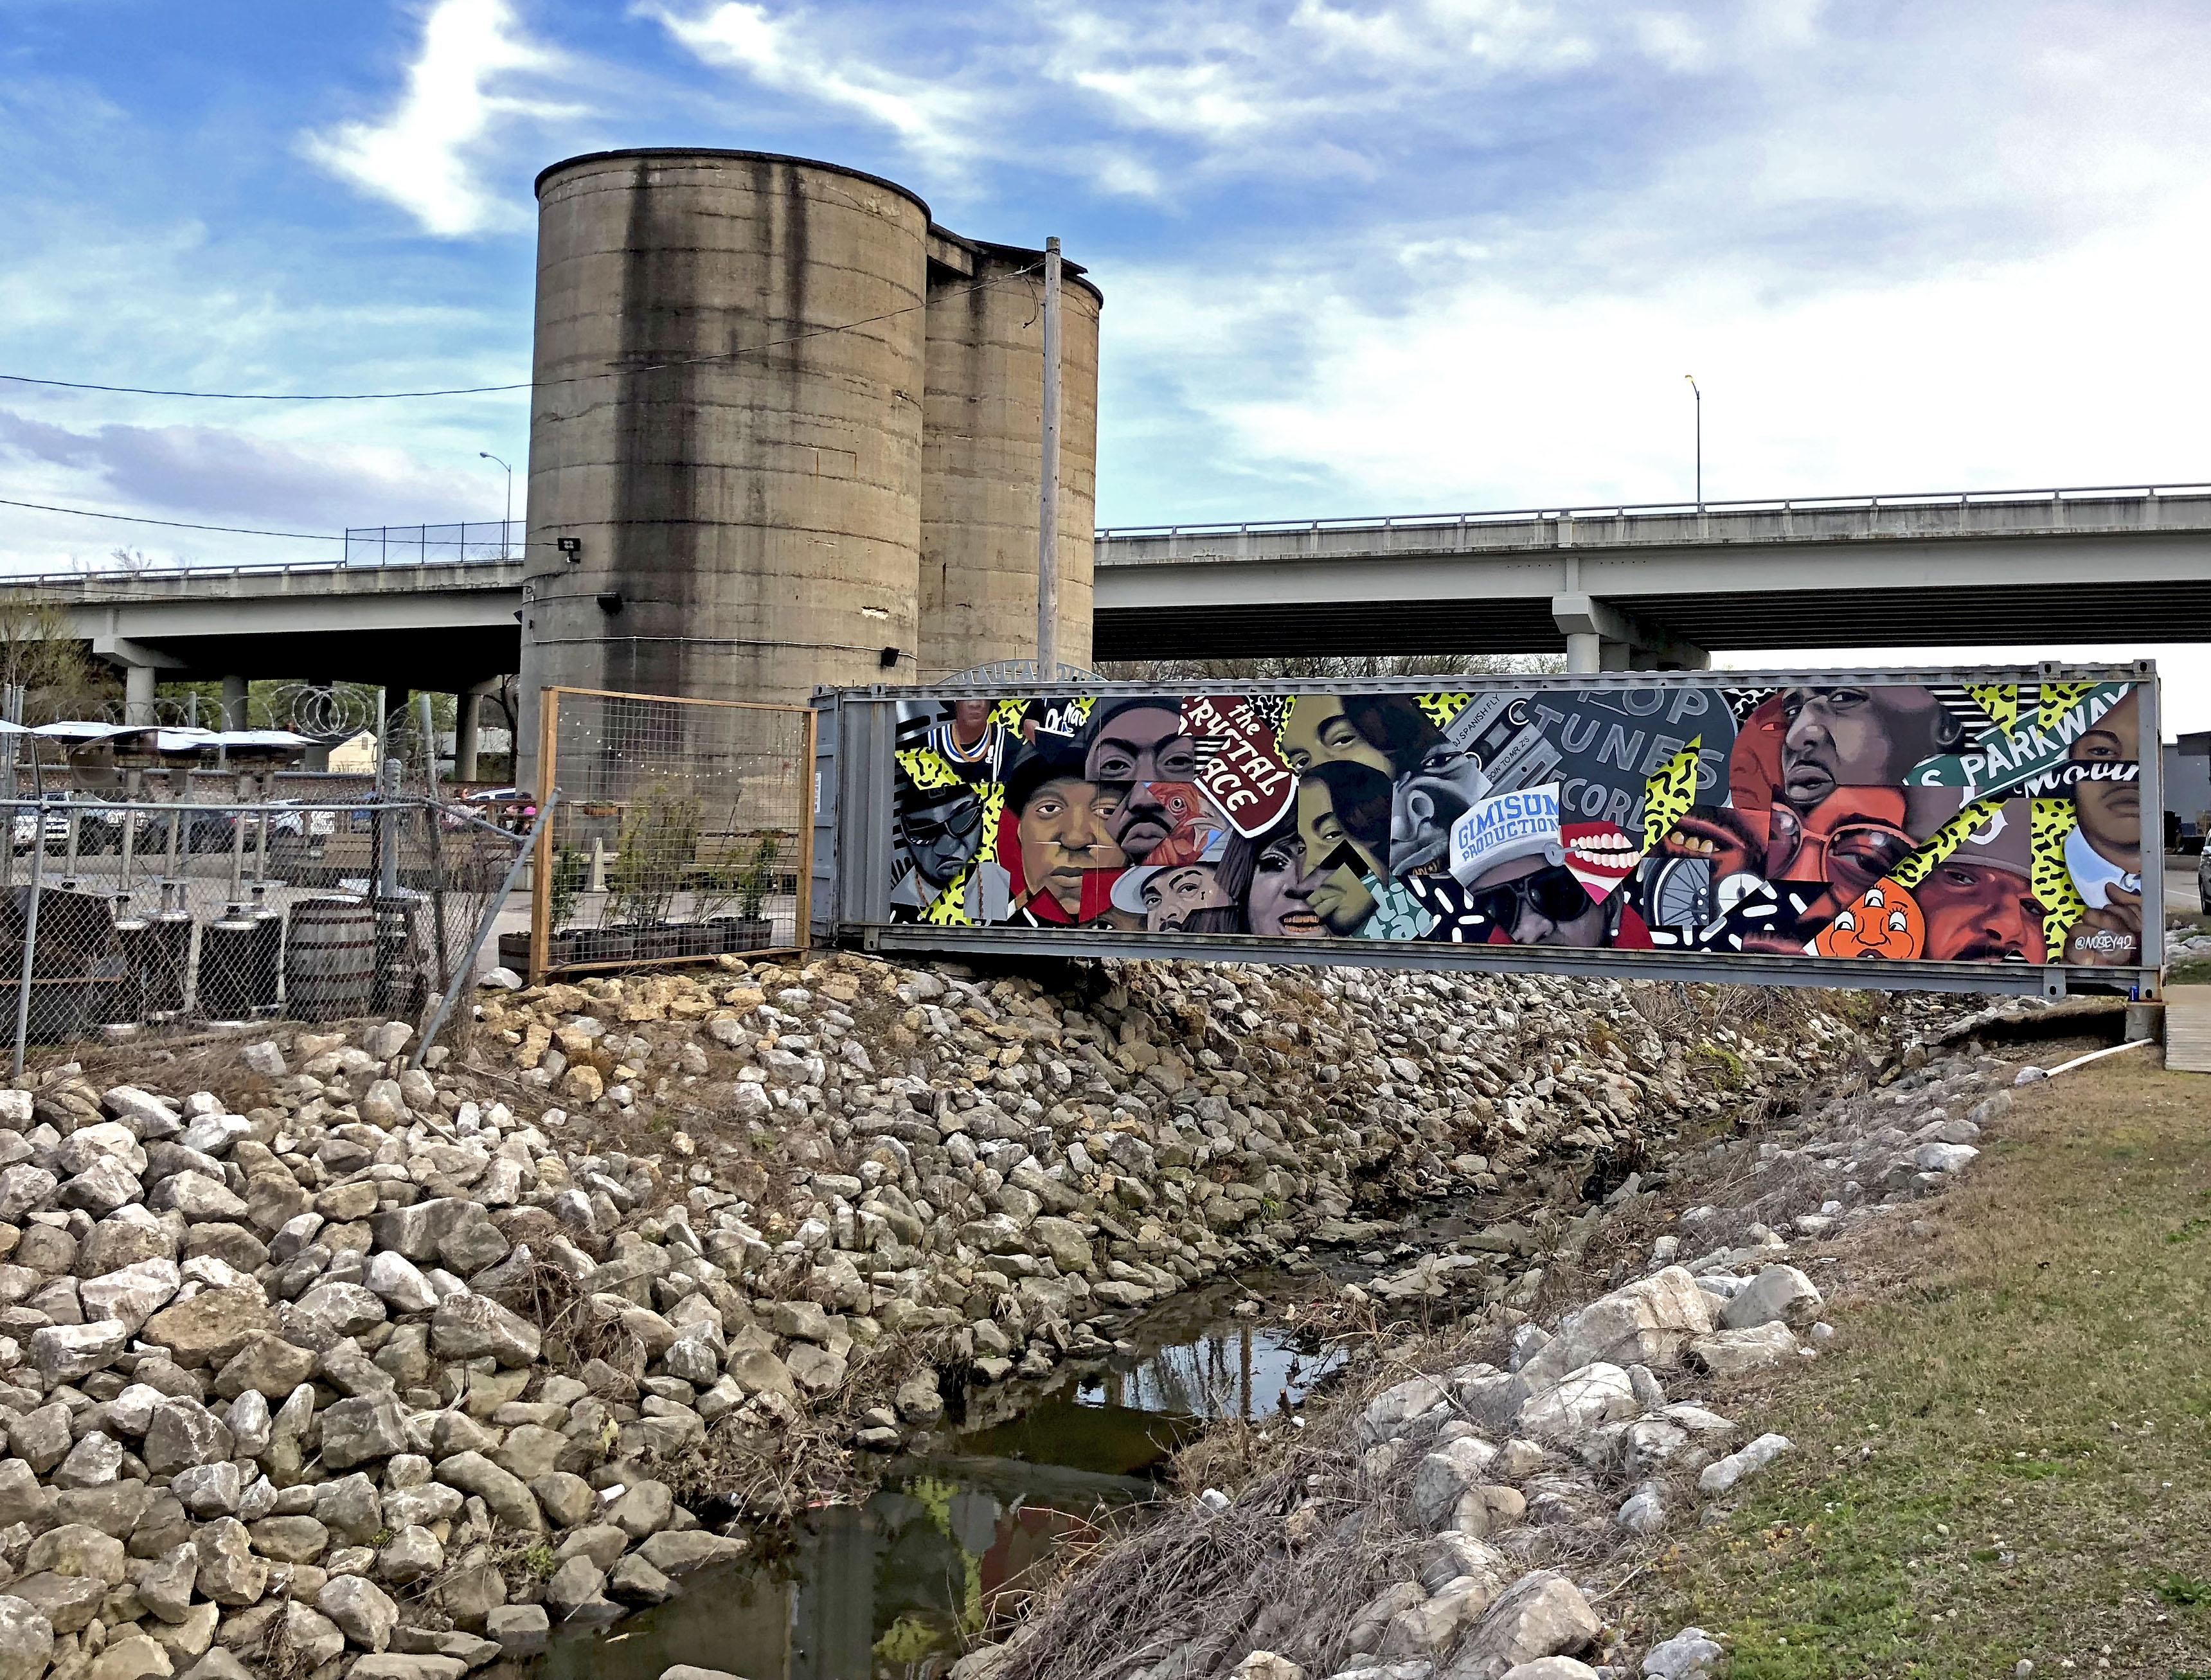 https://www.brandongaiamarshall.com/wp-content/uploads/2018/04/Memphis_Rap_Legends_Mural2.jpg